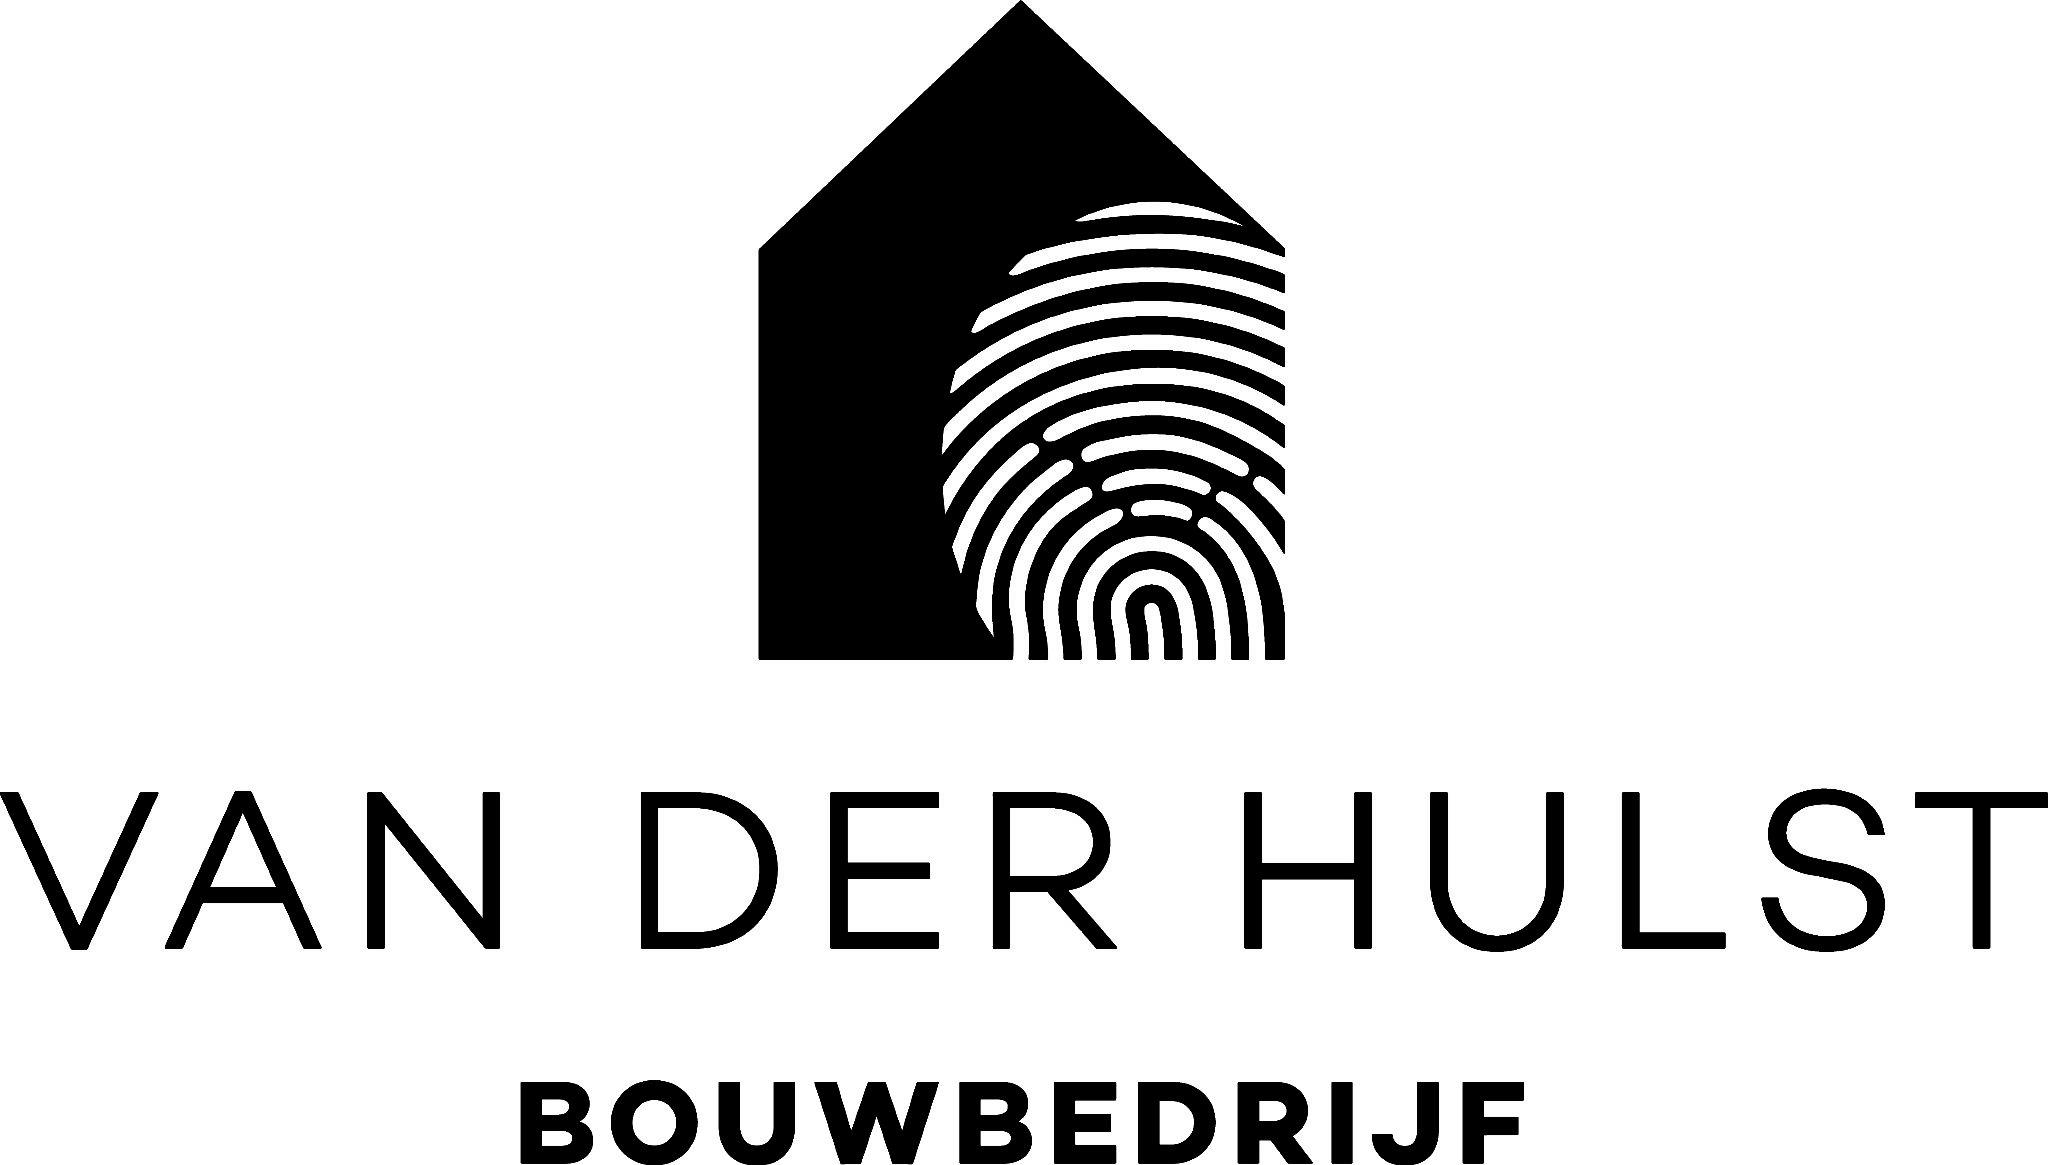 Van der Hulst logo